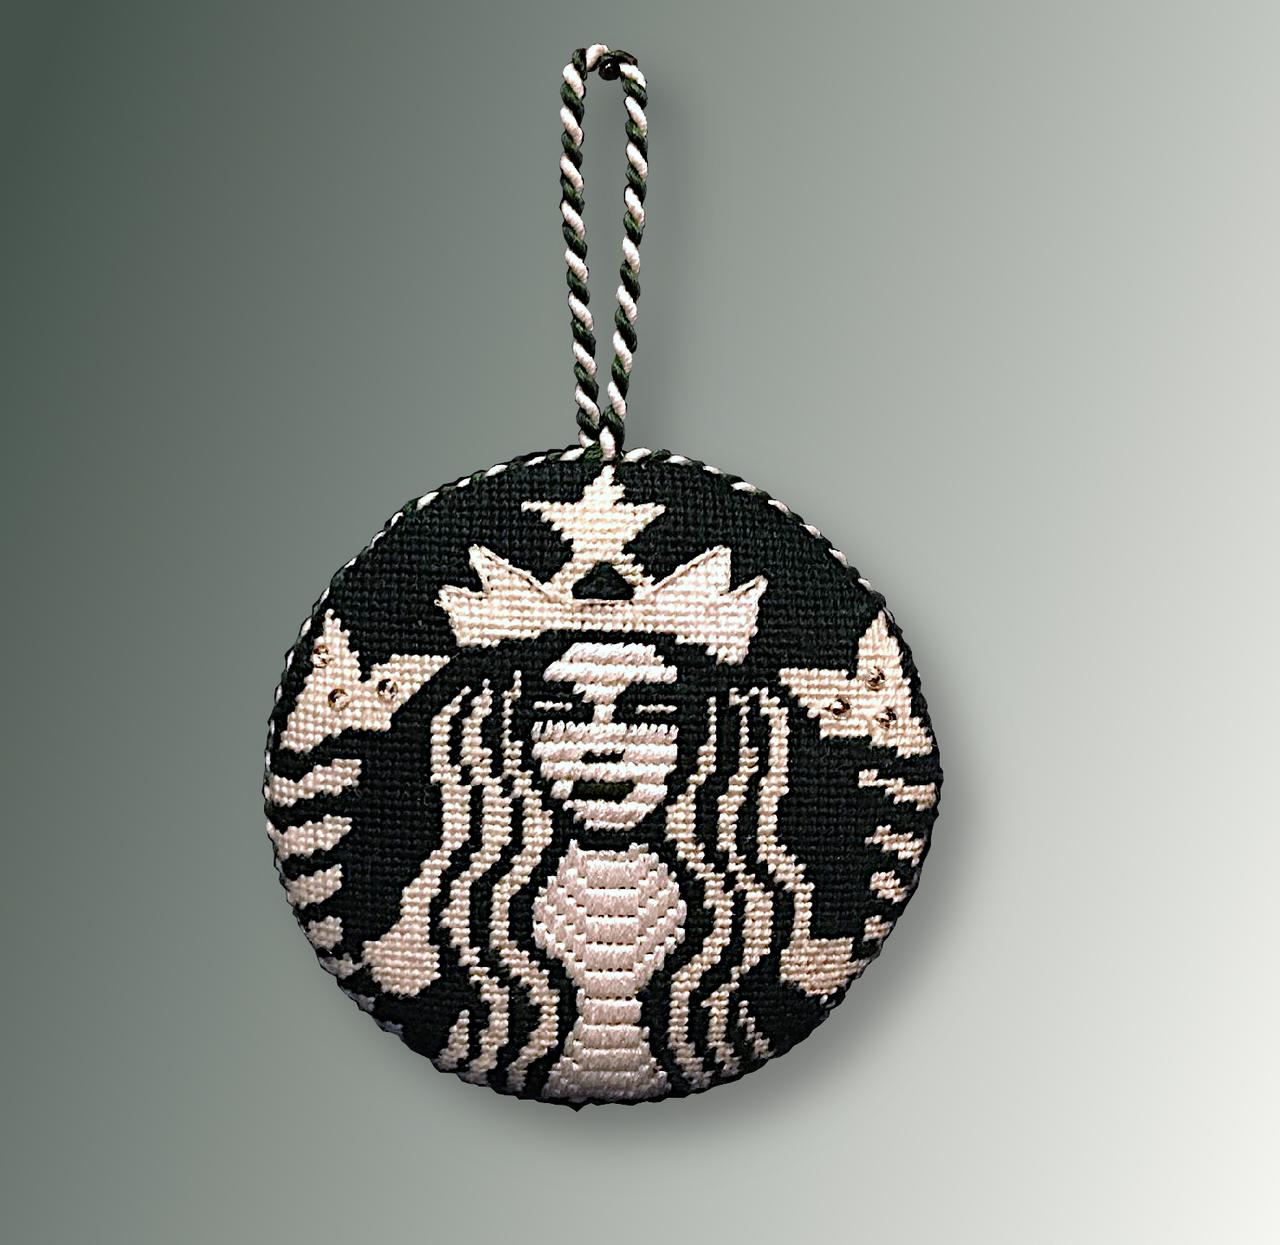 A Starbucks Inspired Needlepoint Ornament & $20 Gift Card